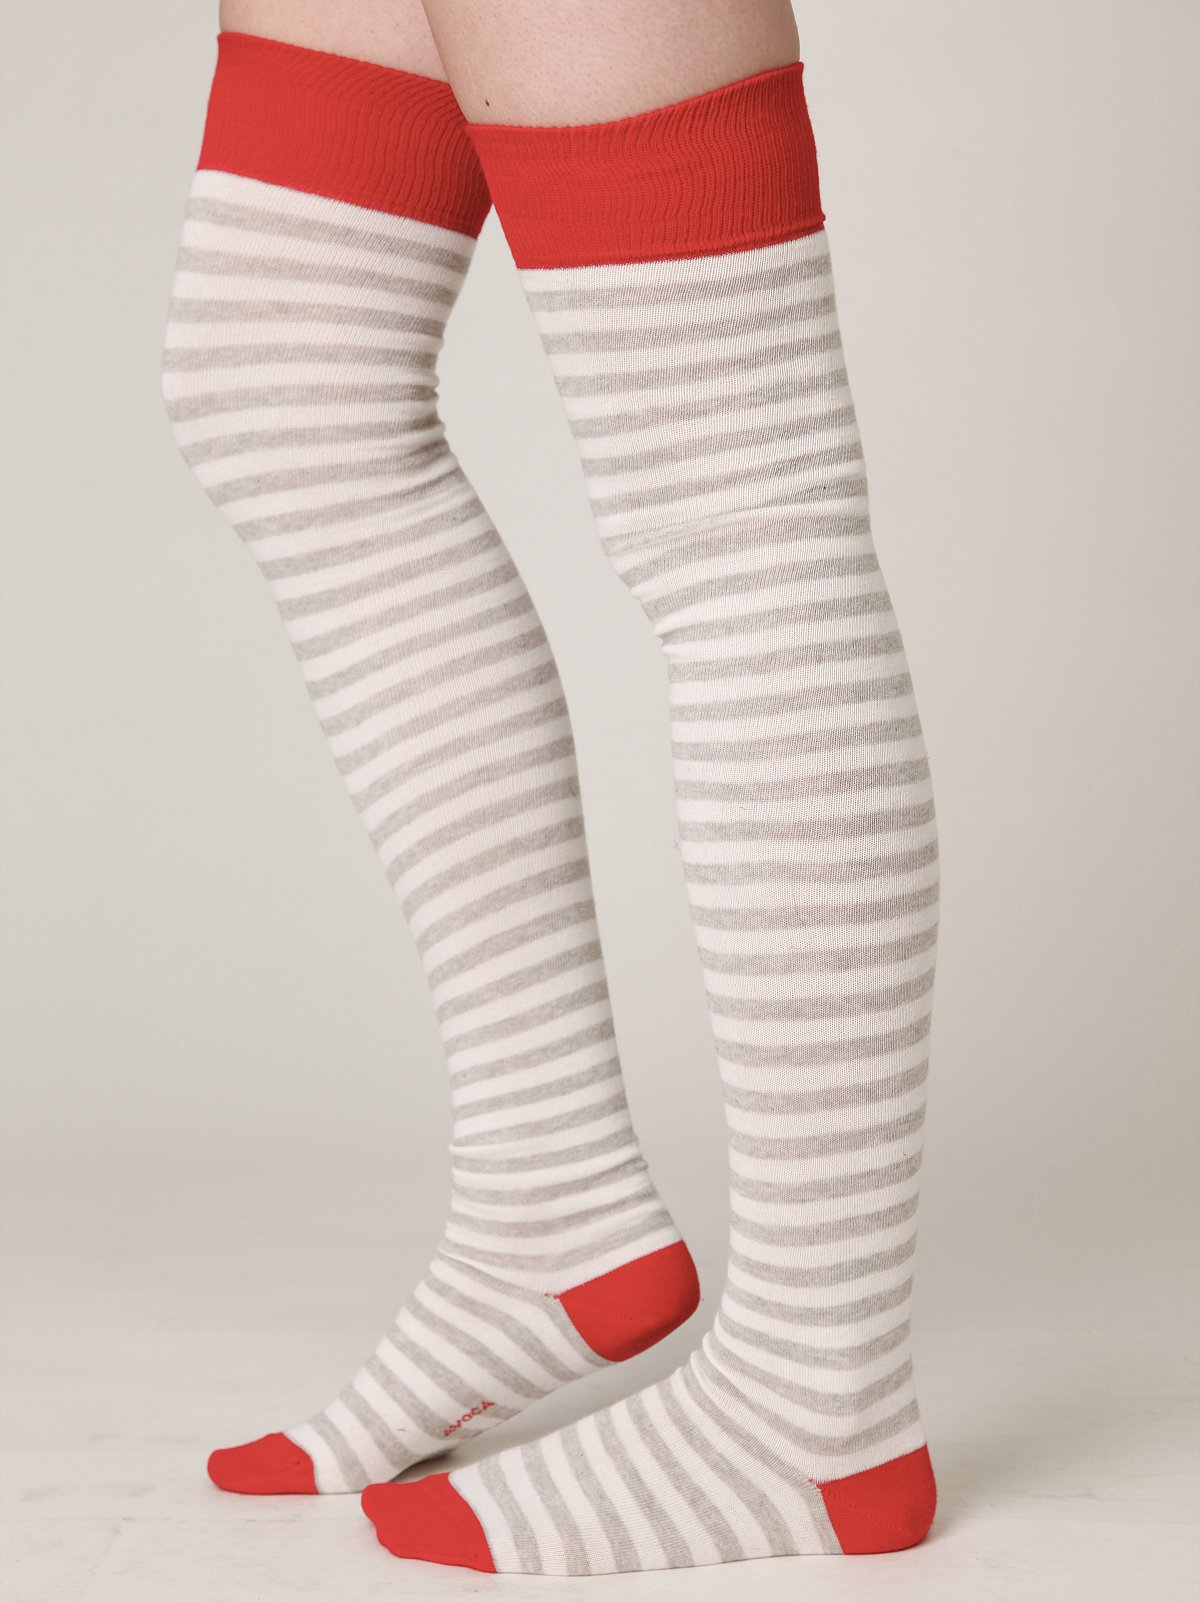 Candy Stripe Tall Sock